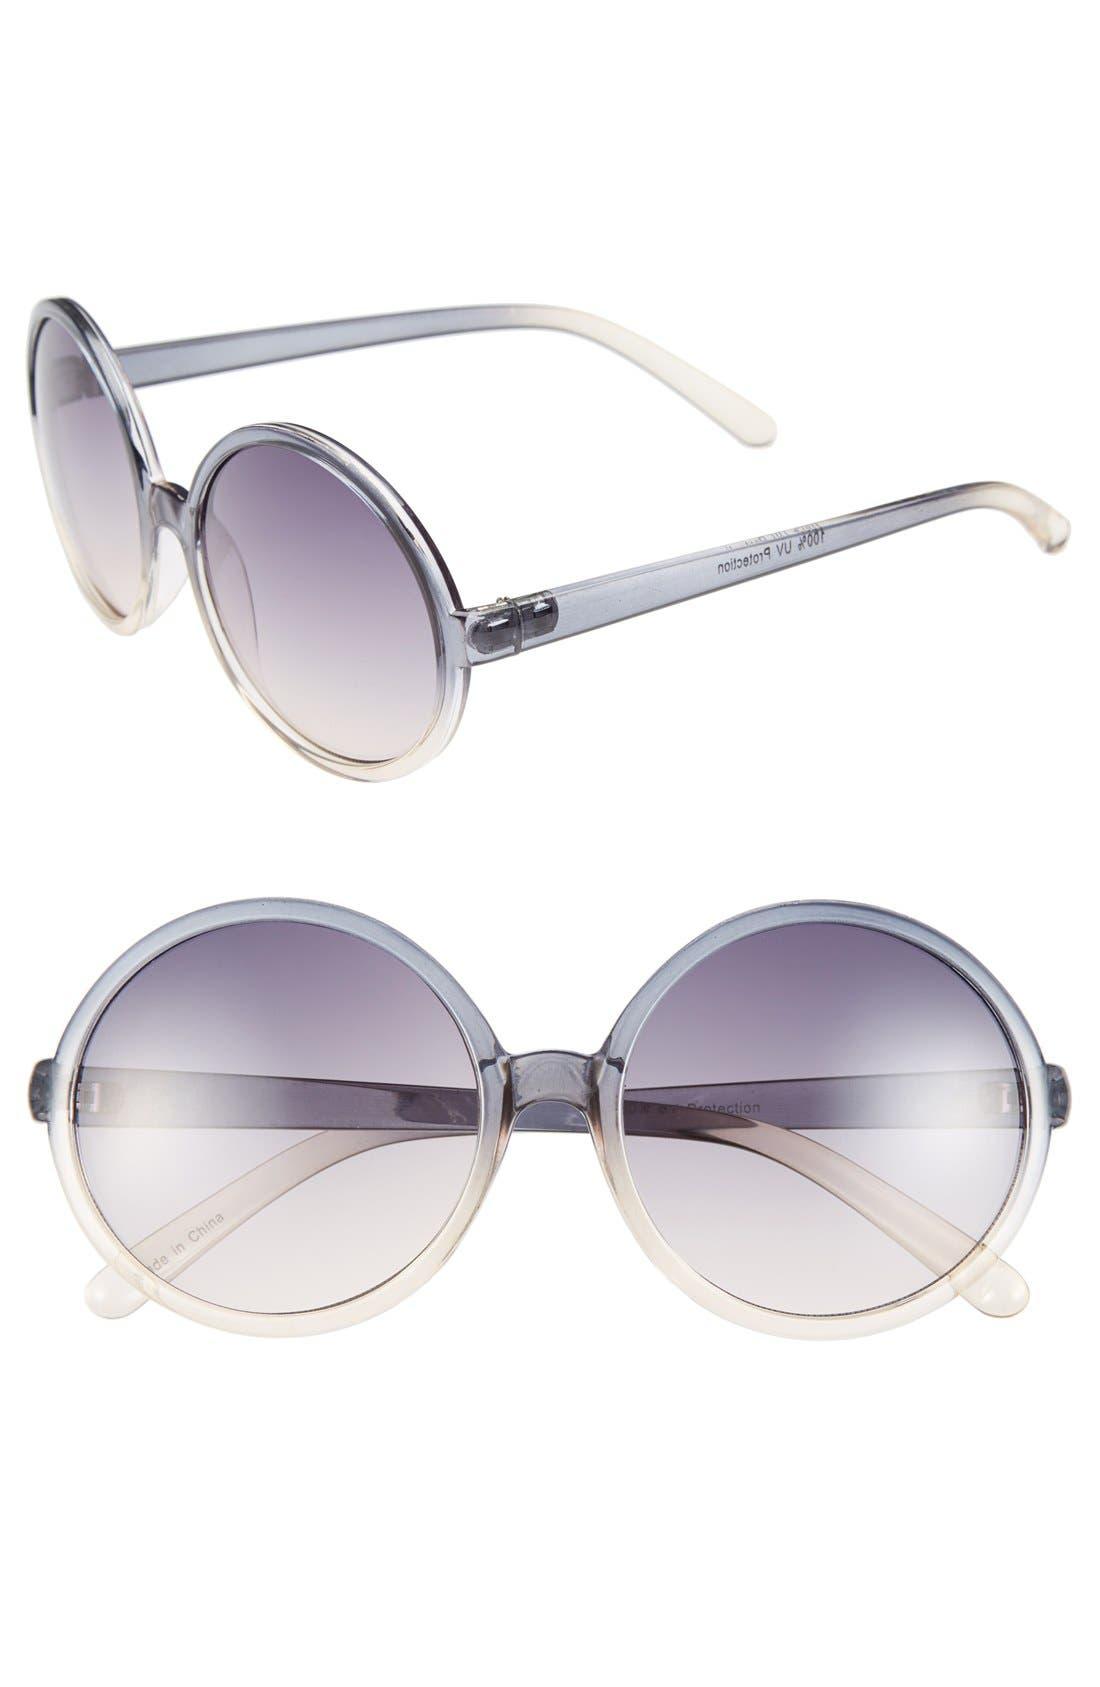 Alternate Image 1 Selected - Fantas Eyes 'Money Penny' 63mm Sunglasses (Juniors)